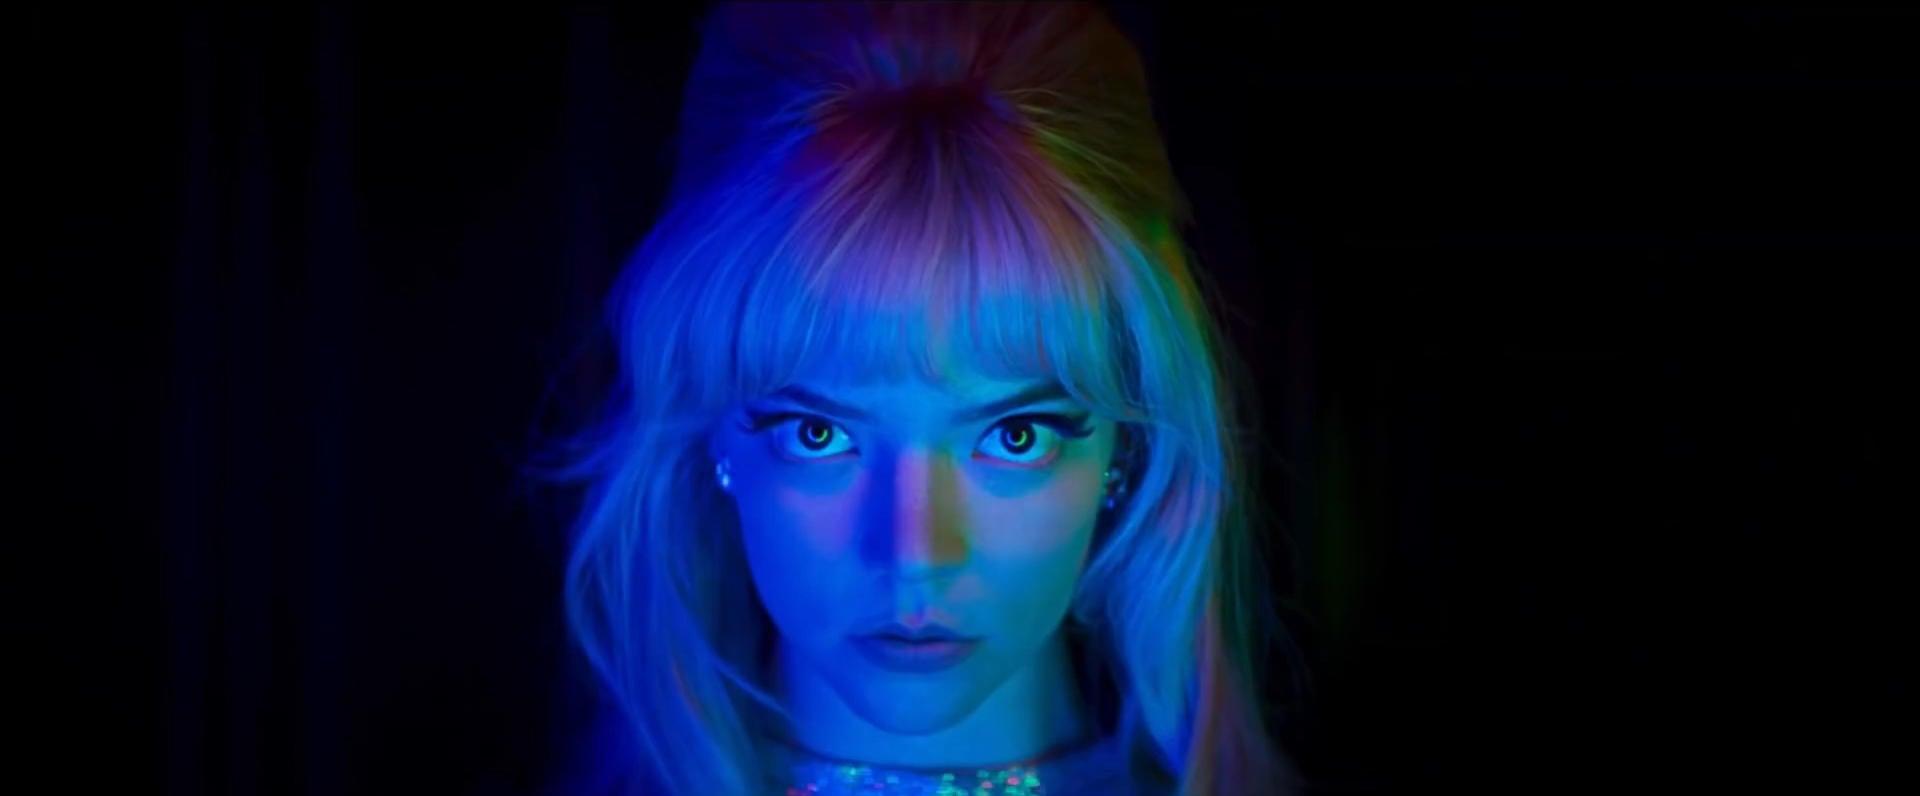 Last Night in Soho - Official Teaser Trailer